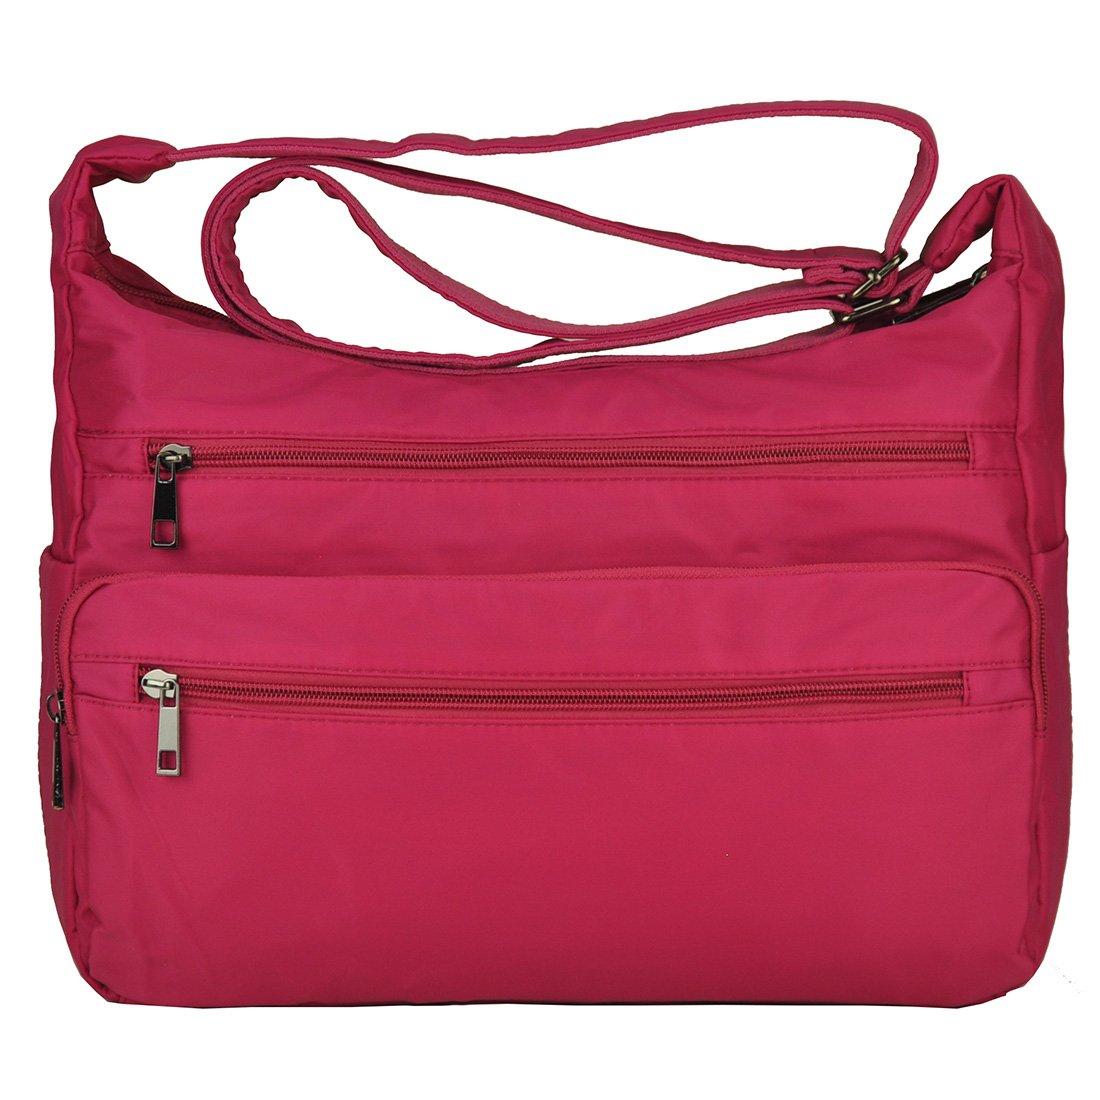 Volcanic Rock Lightweigh Shoulder Bags Messenger Handbags Multi Pocket Nylon Waterproof Crossbody Bags